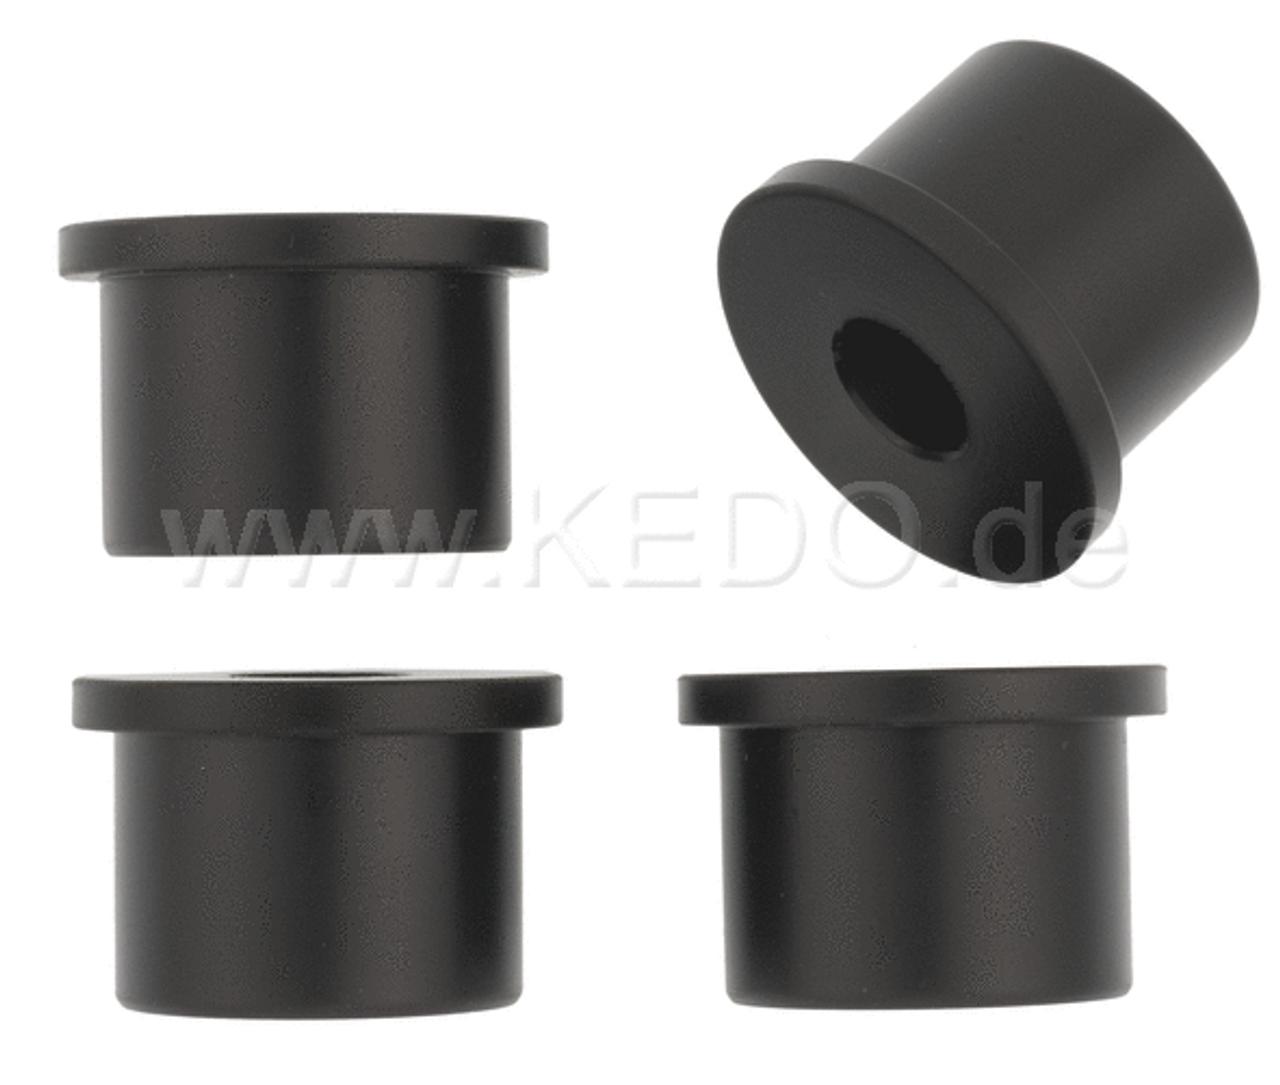 KEDO Top Yoke Bushings (Massive) for Handlebar Clamp, Black Plastic, Set of 4